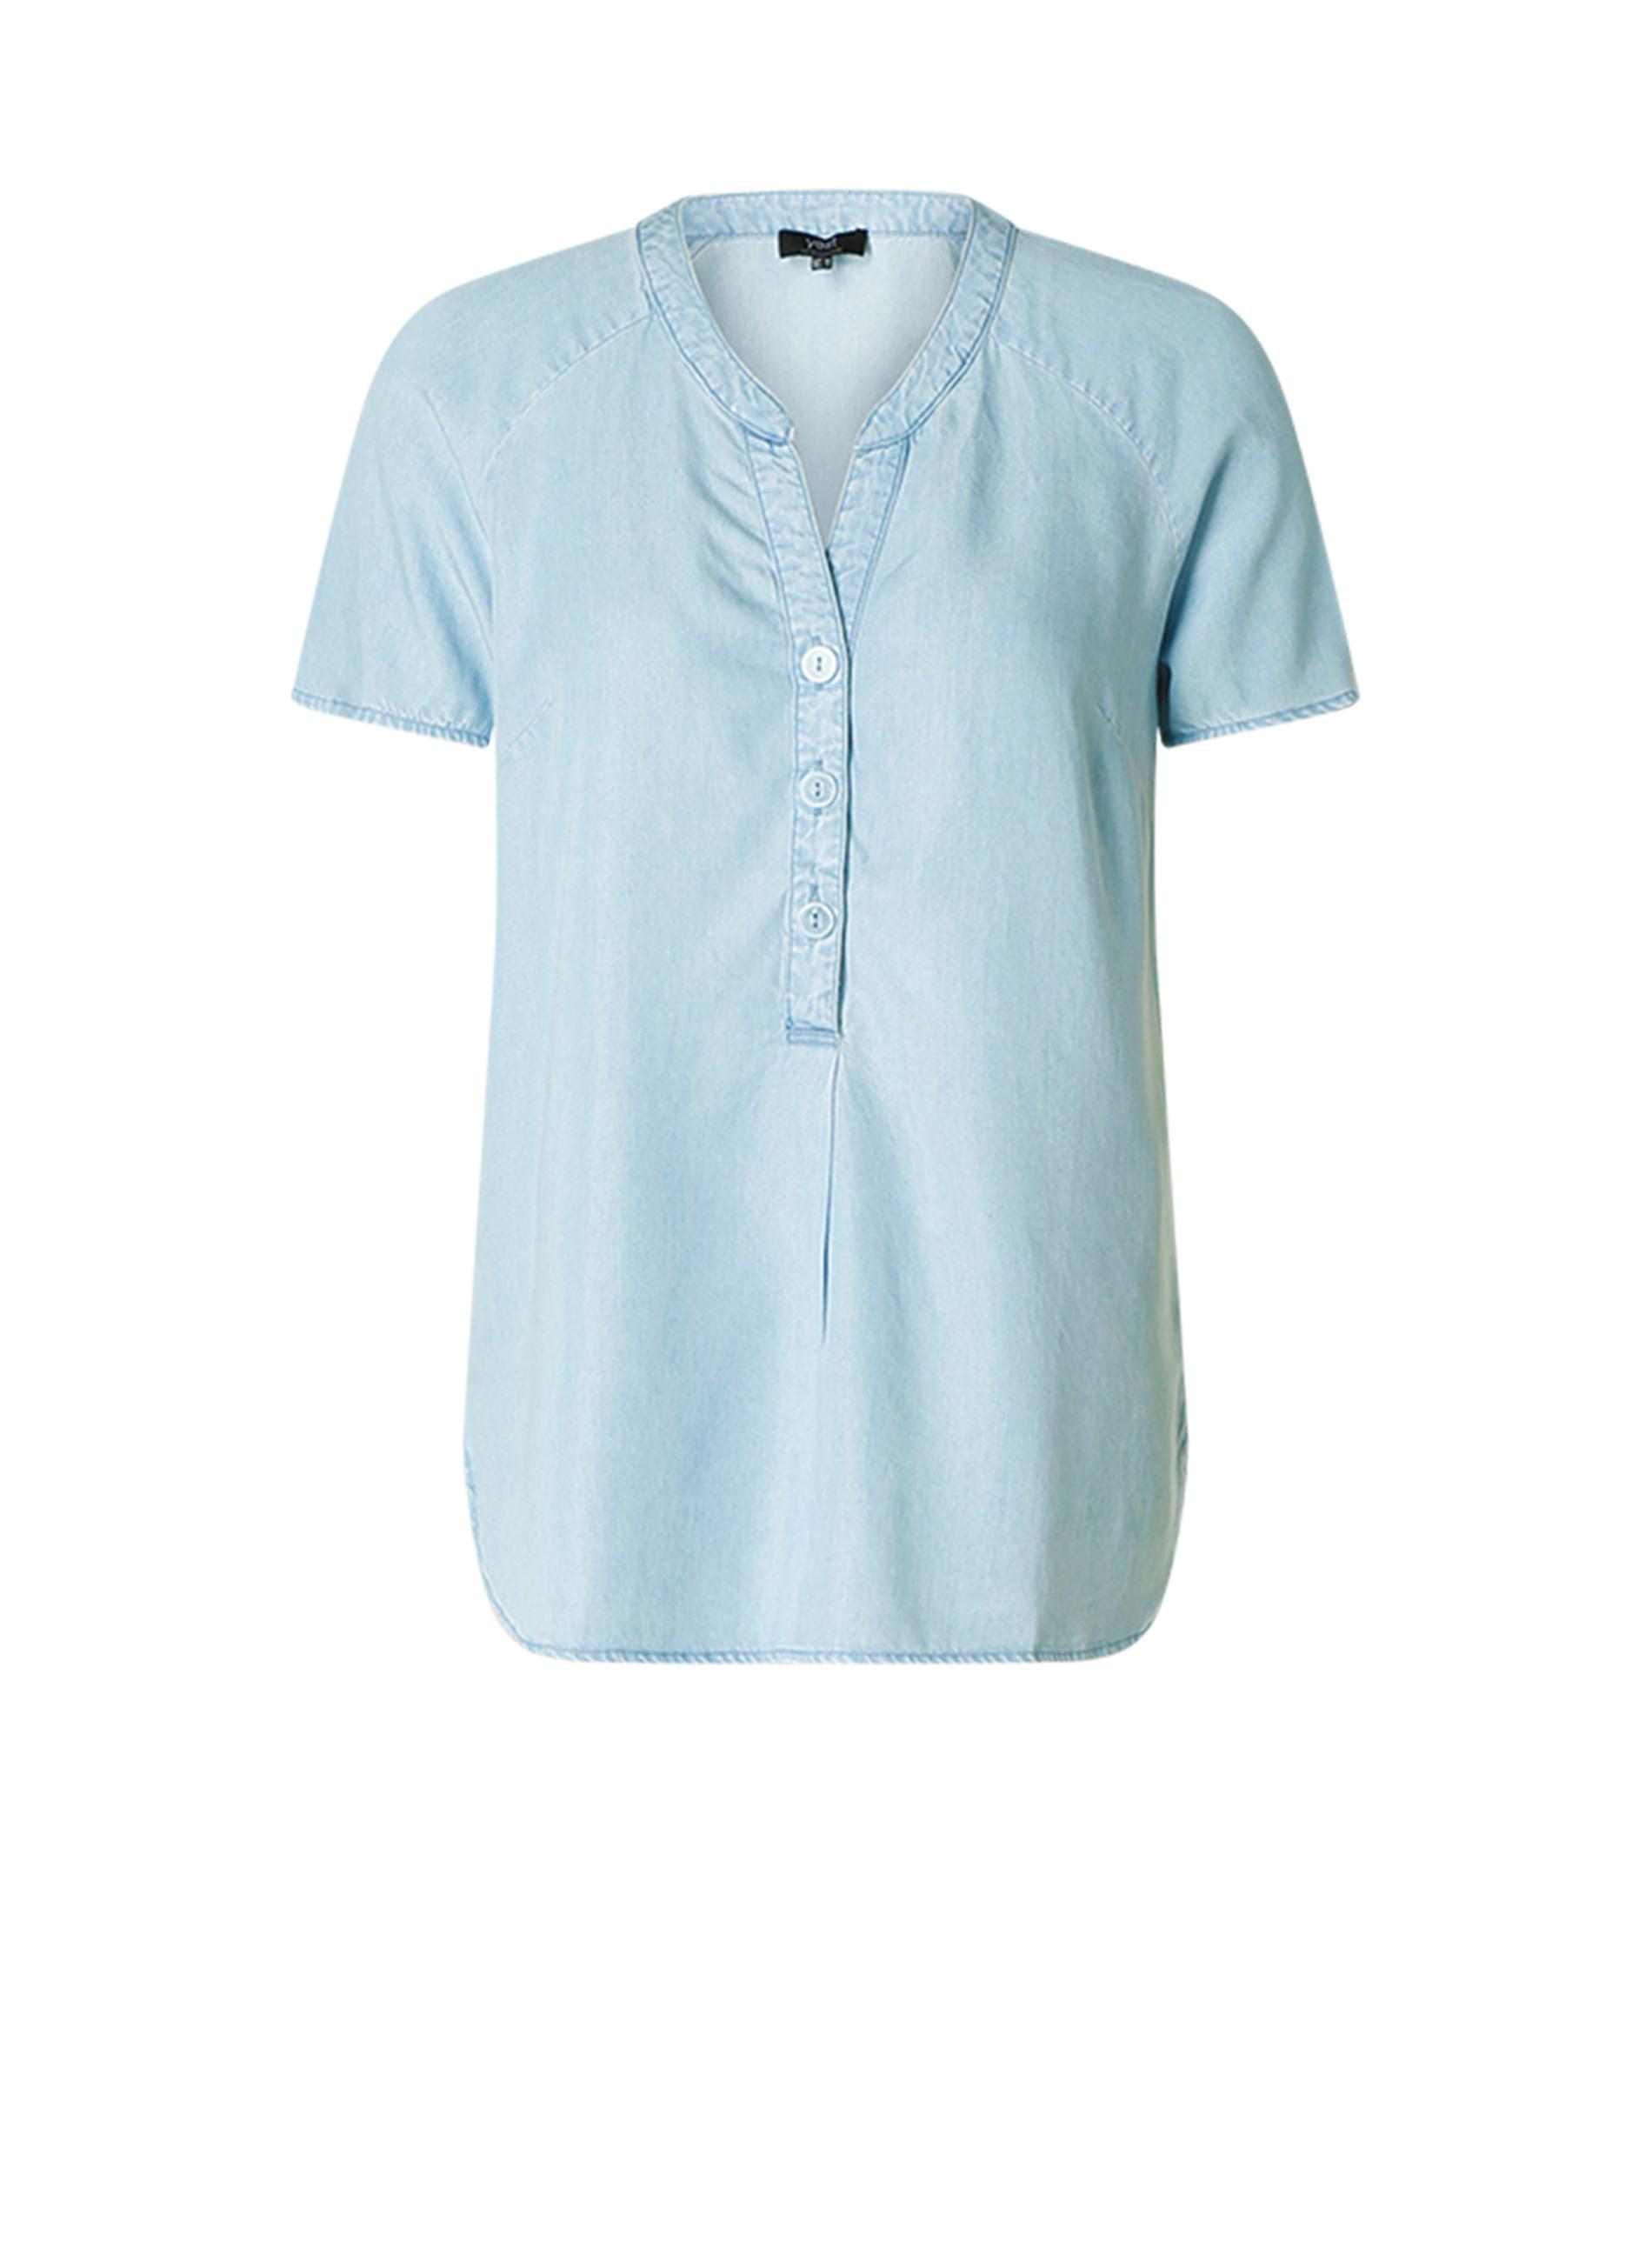 Yest blouse Kaley 72 cm